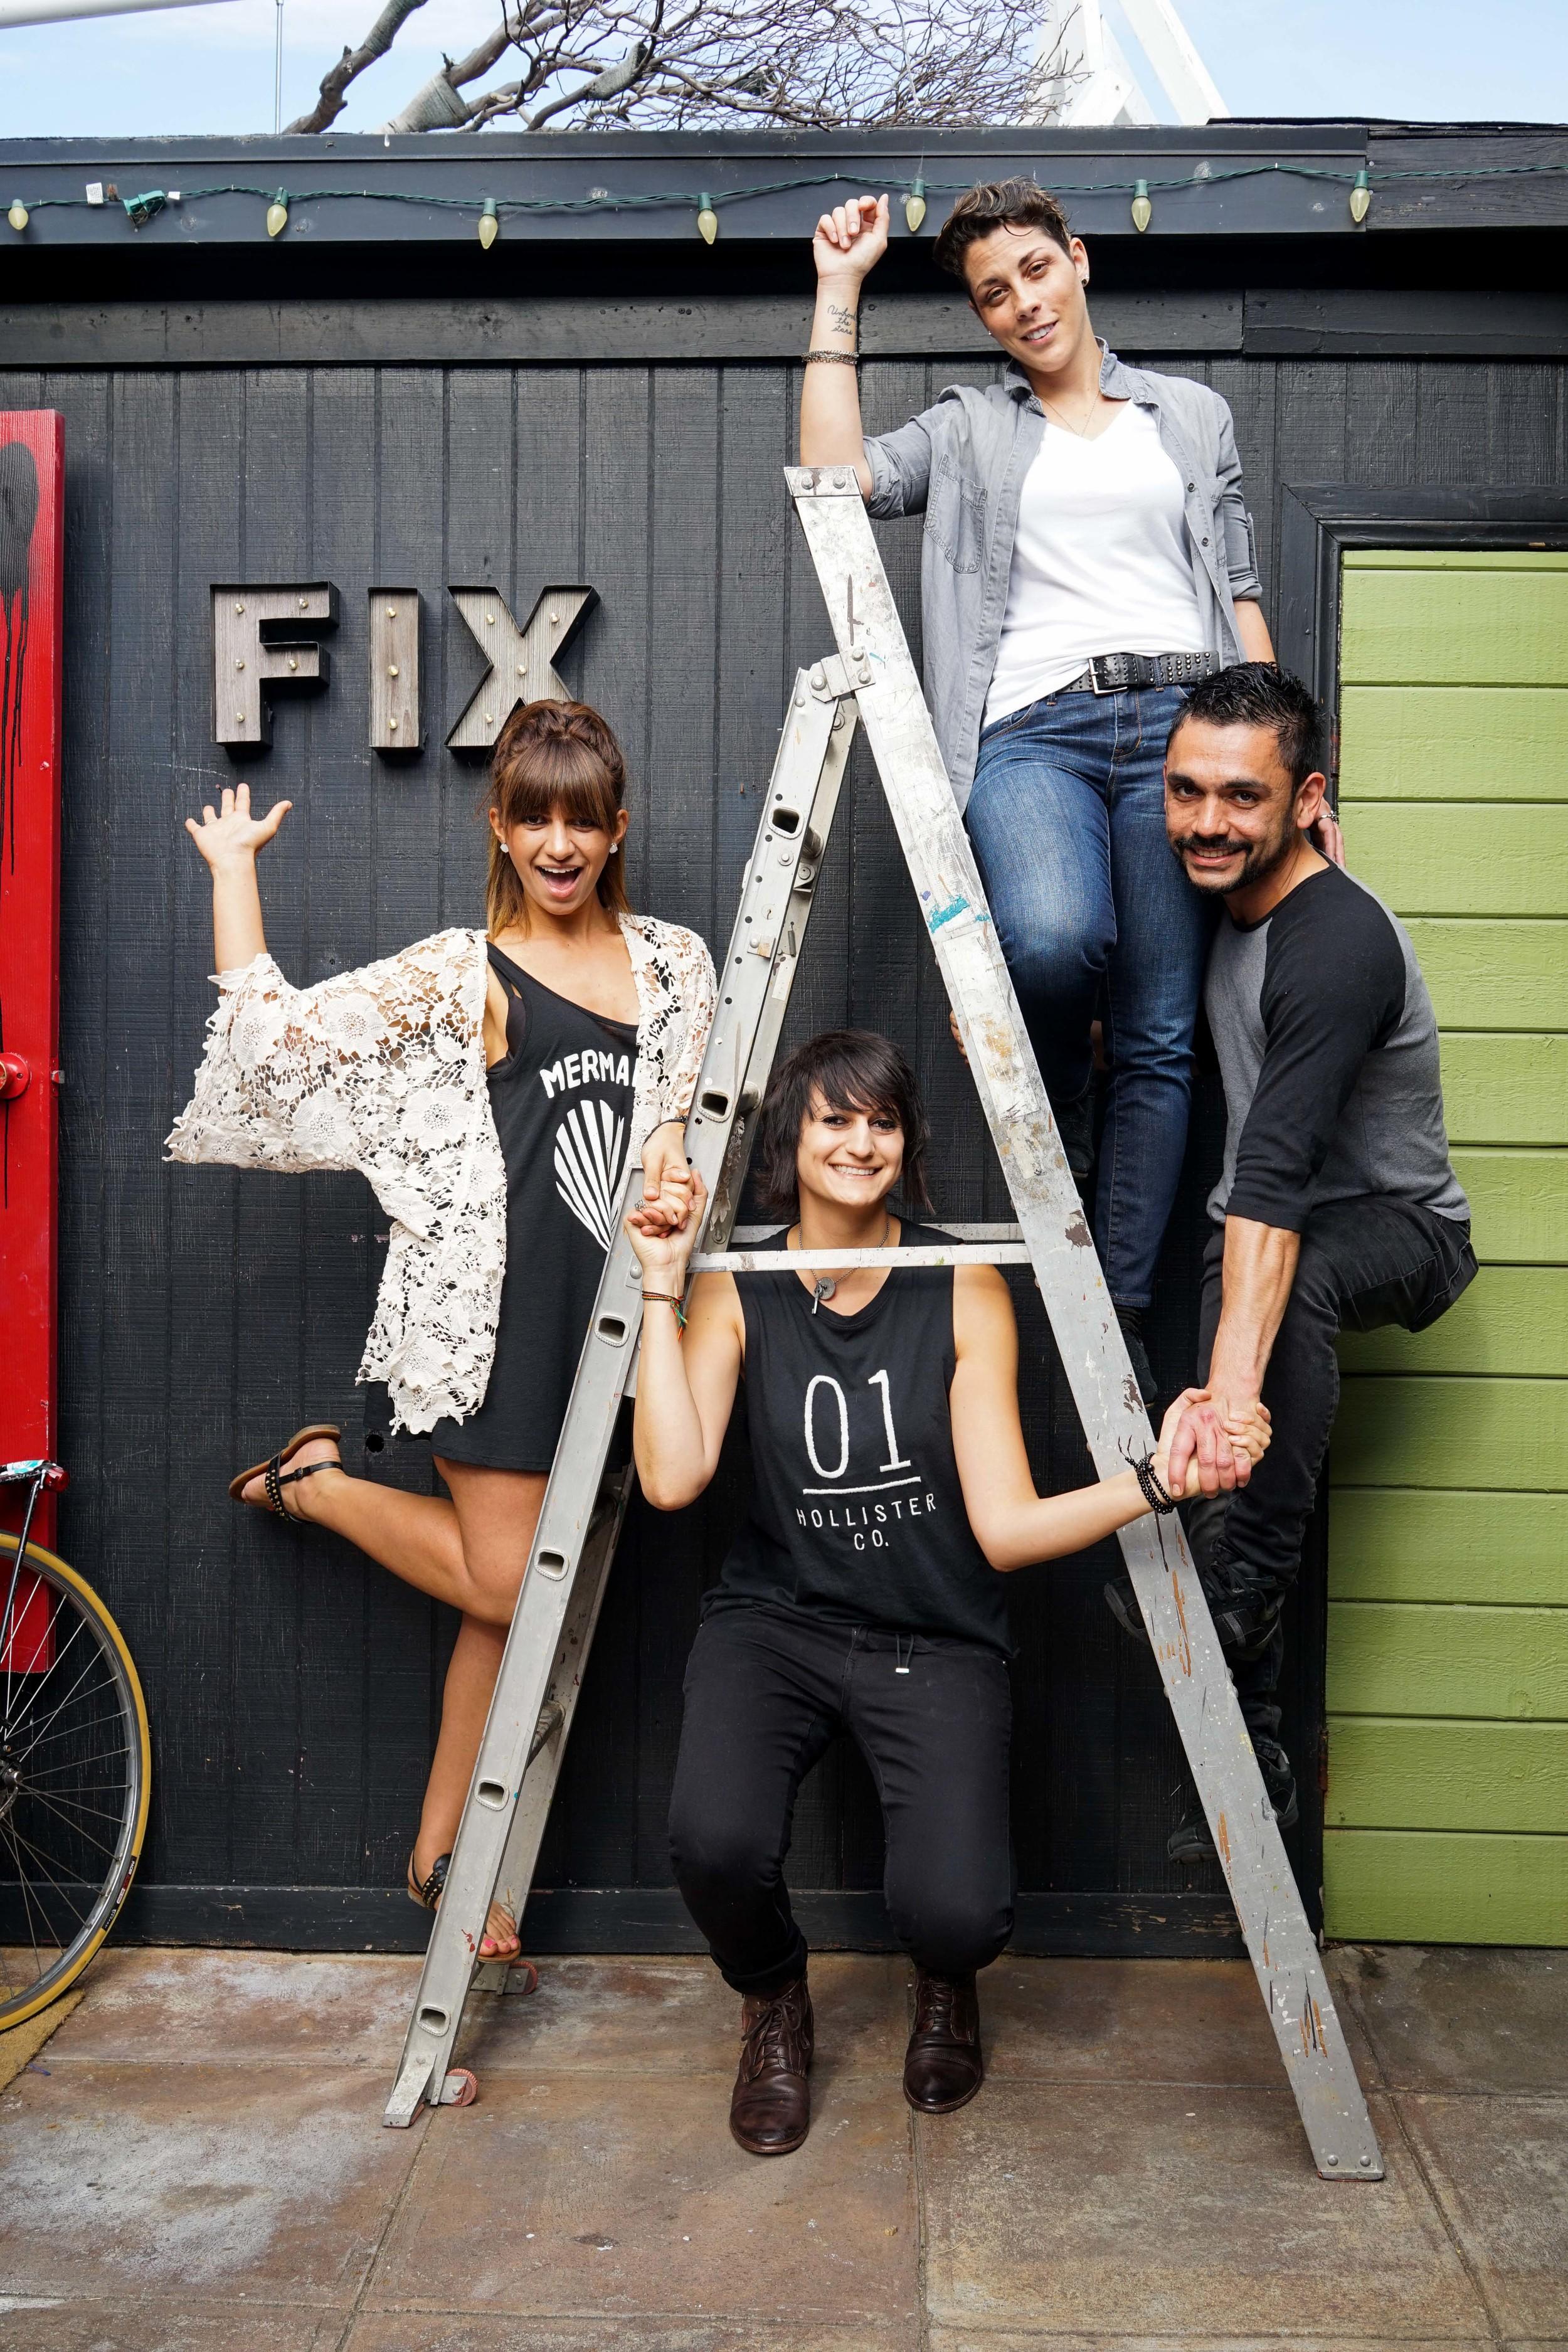 Clockwise: Brandi Kirschbaum, Antonio Zepeda, Dottie Necool and Chanel Konja. Photo by Jose Lopez.